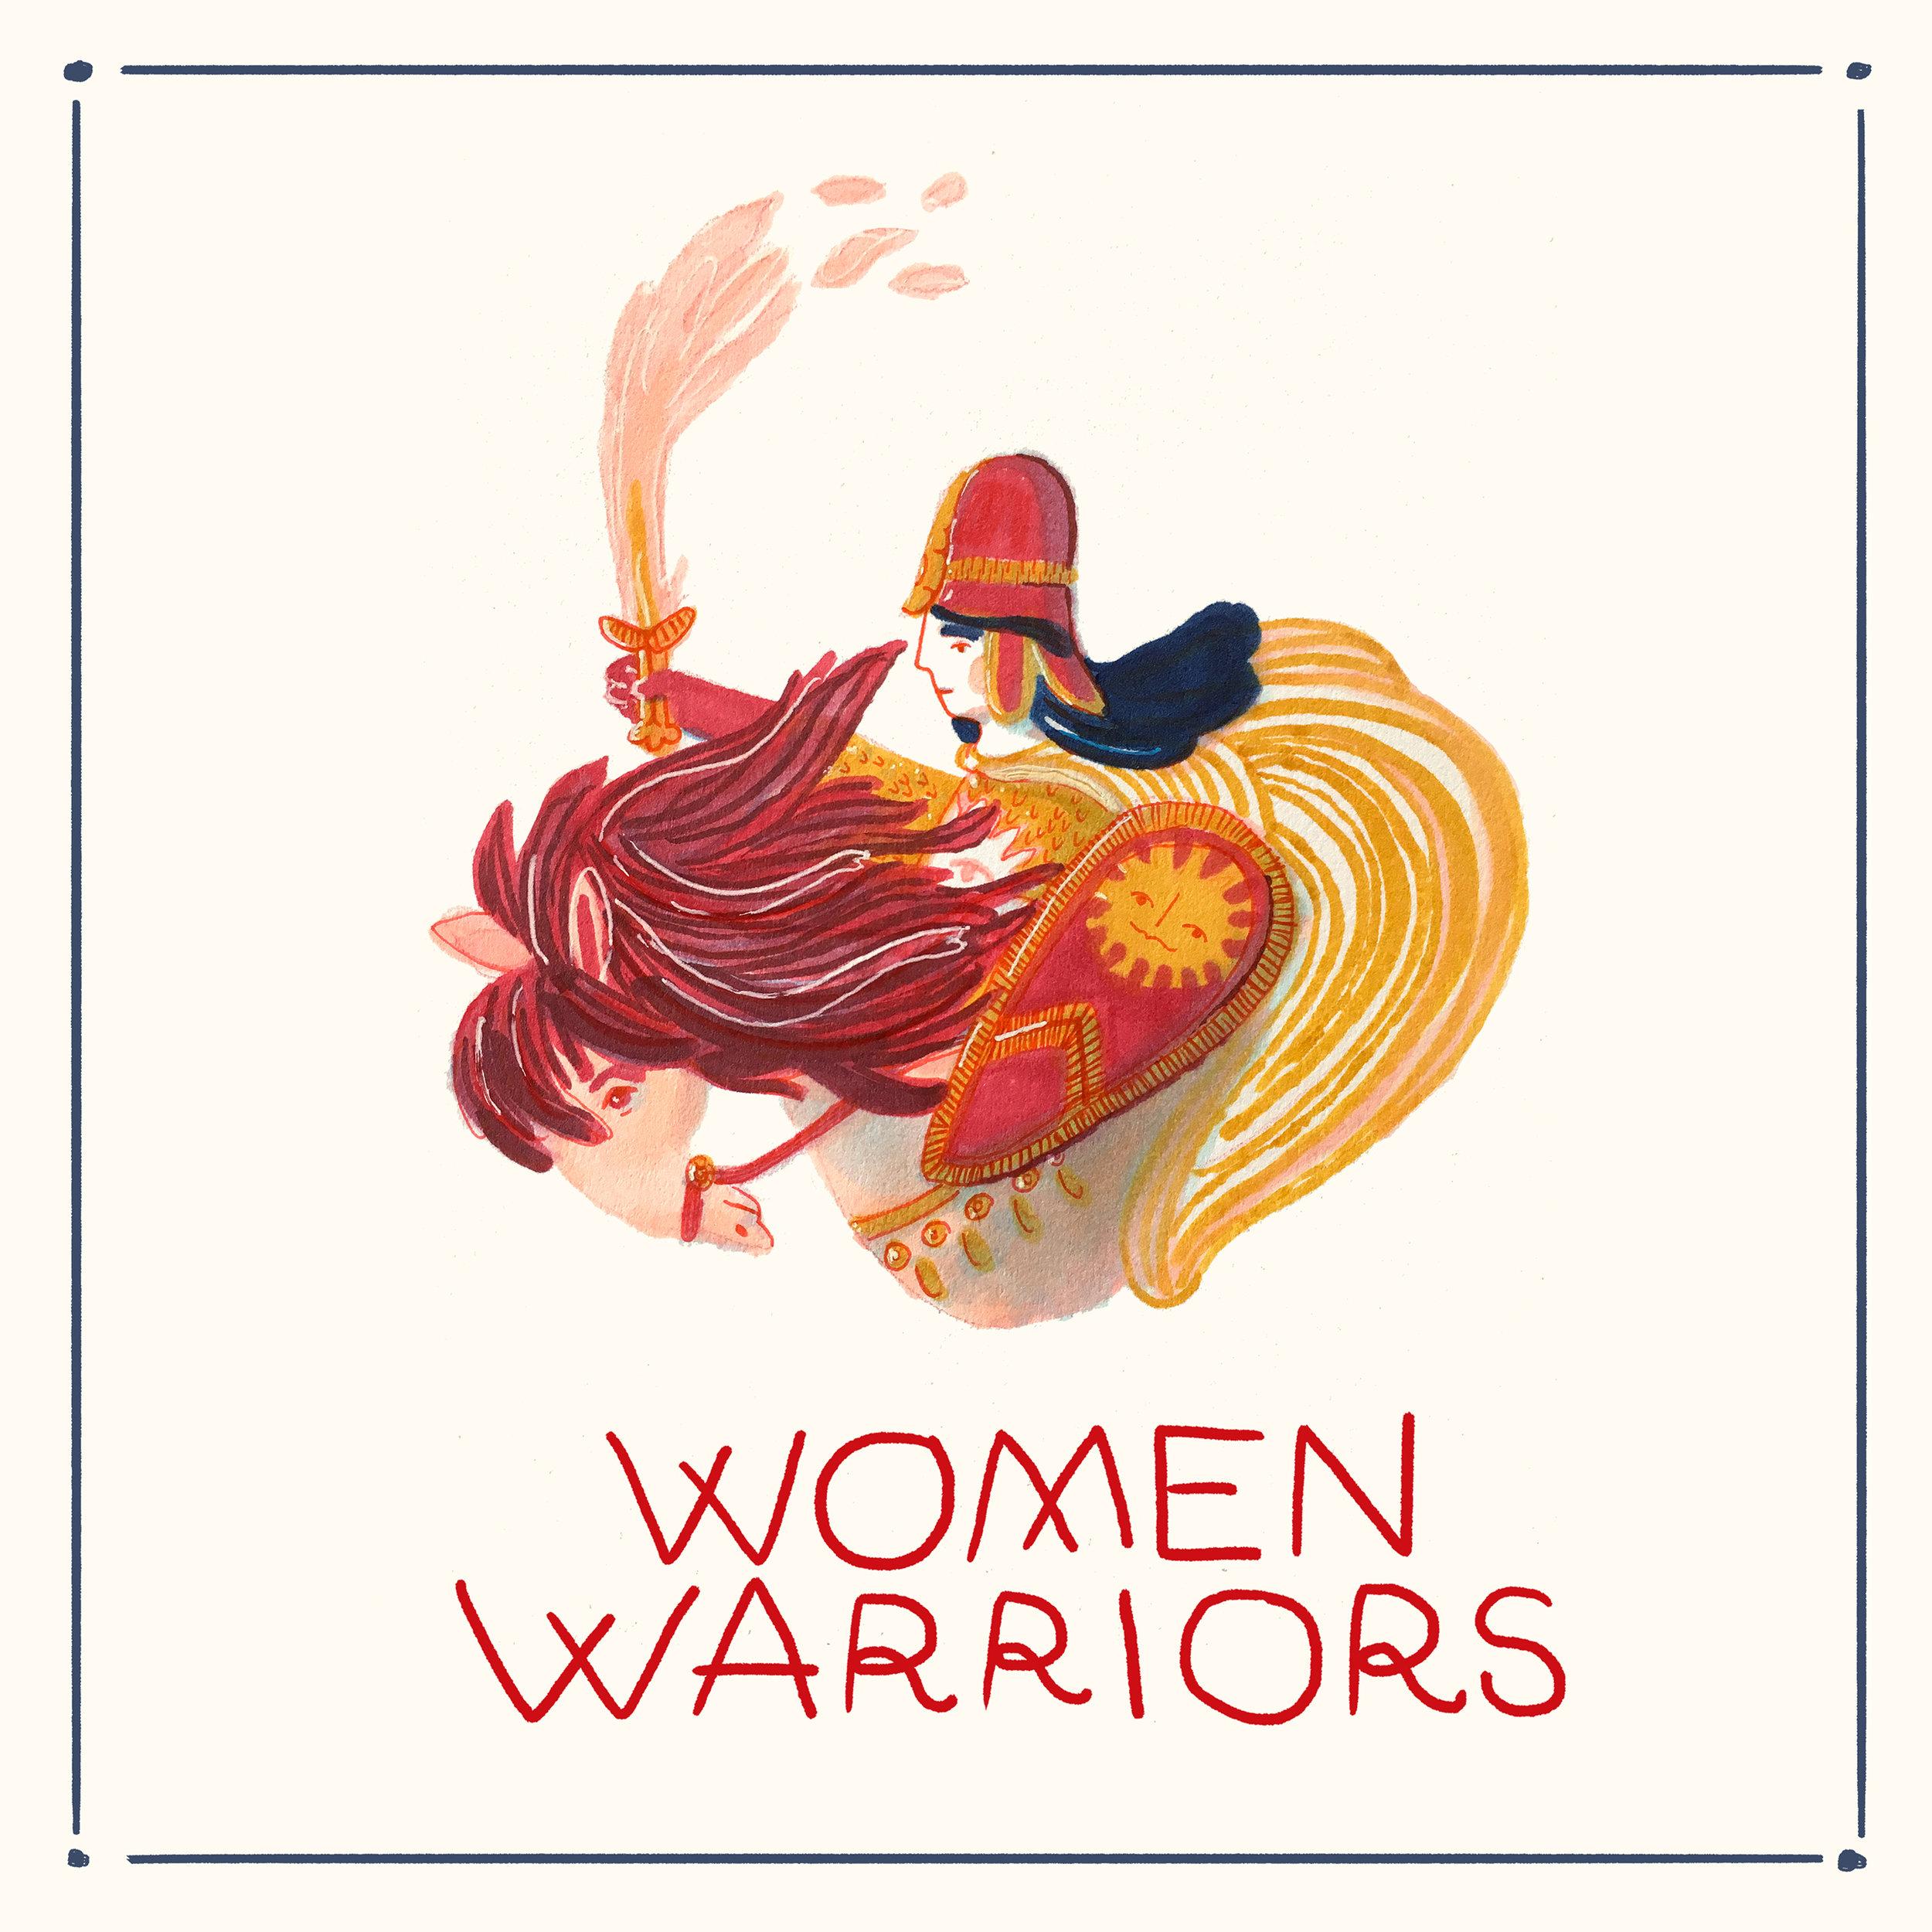 women_warriors_web.jpg